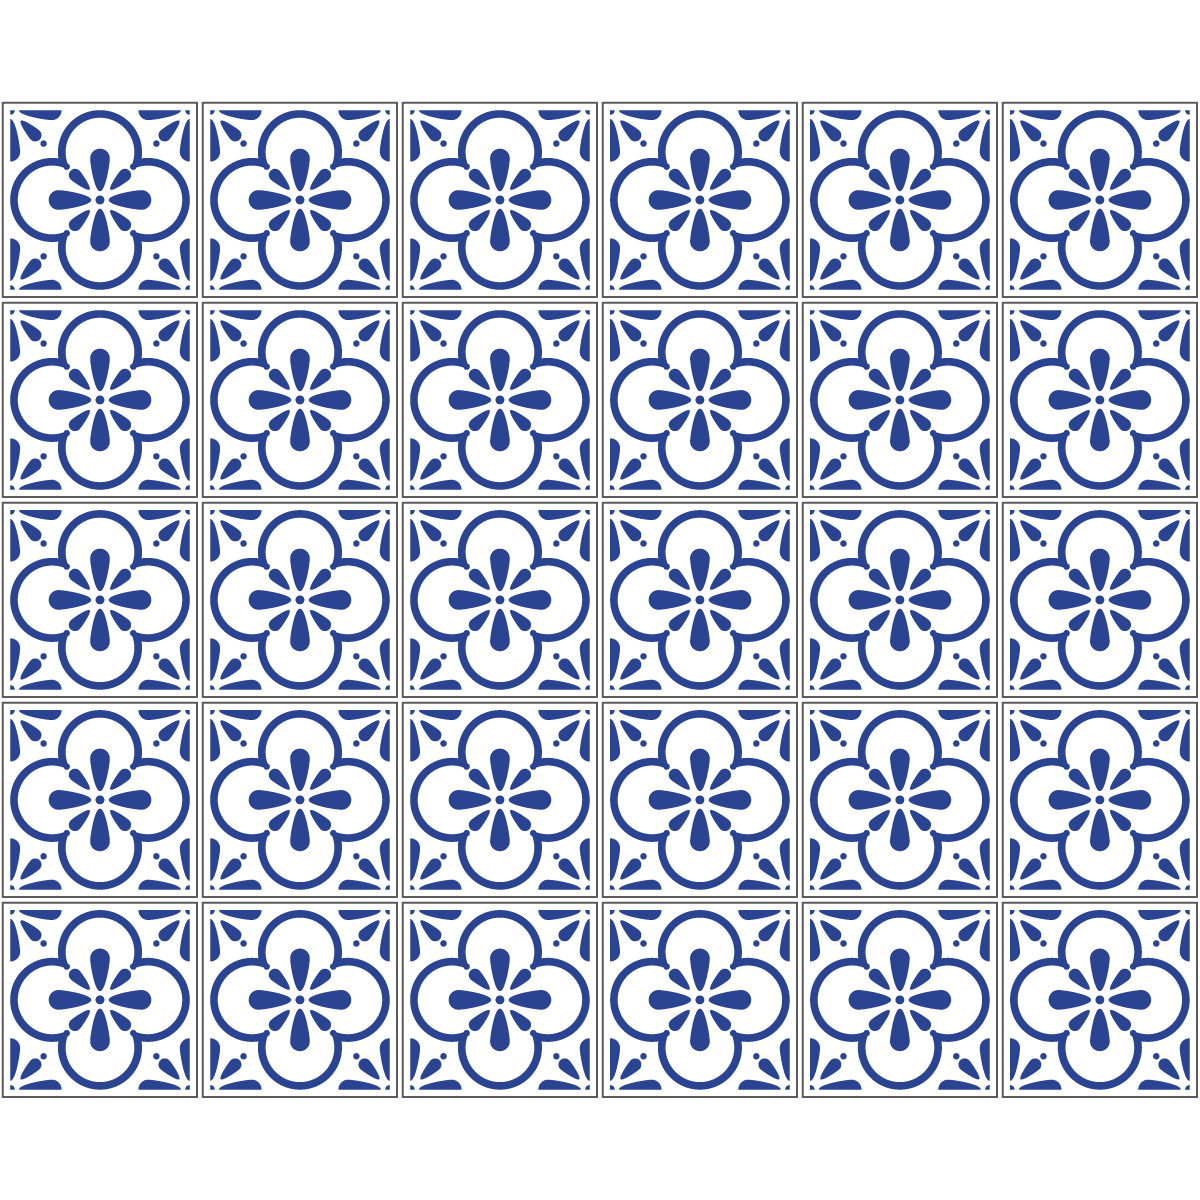 30 stickers carreaux de ciment azulejos aroha cuisine. Black Bedroom Furniture Sets. Home Design Ideas